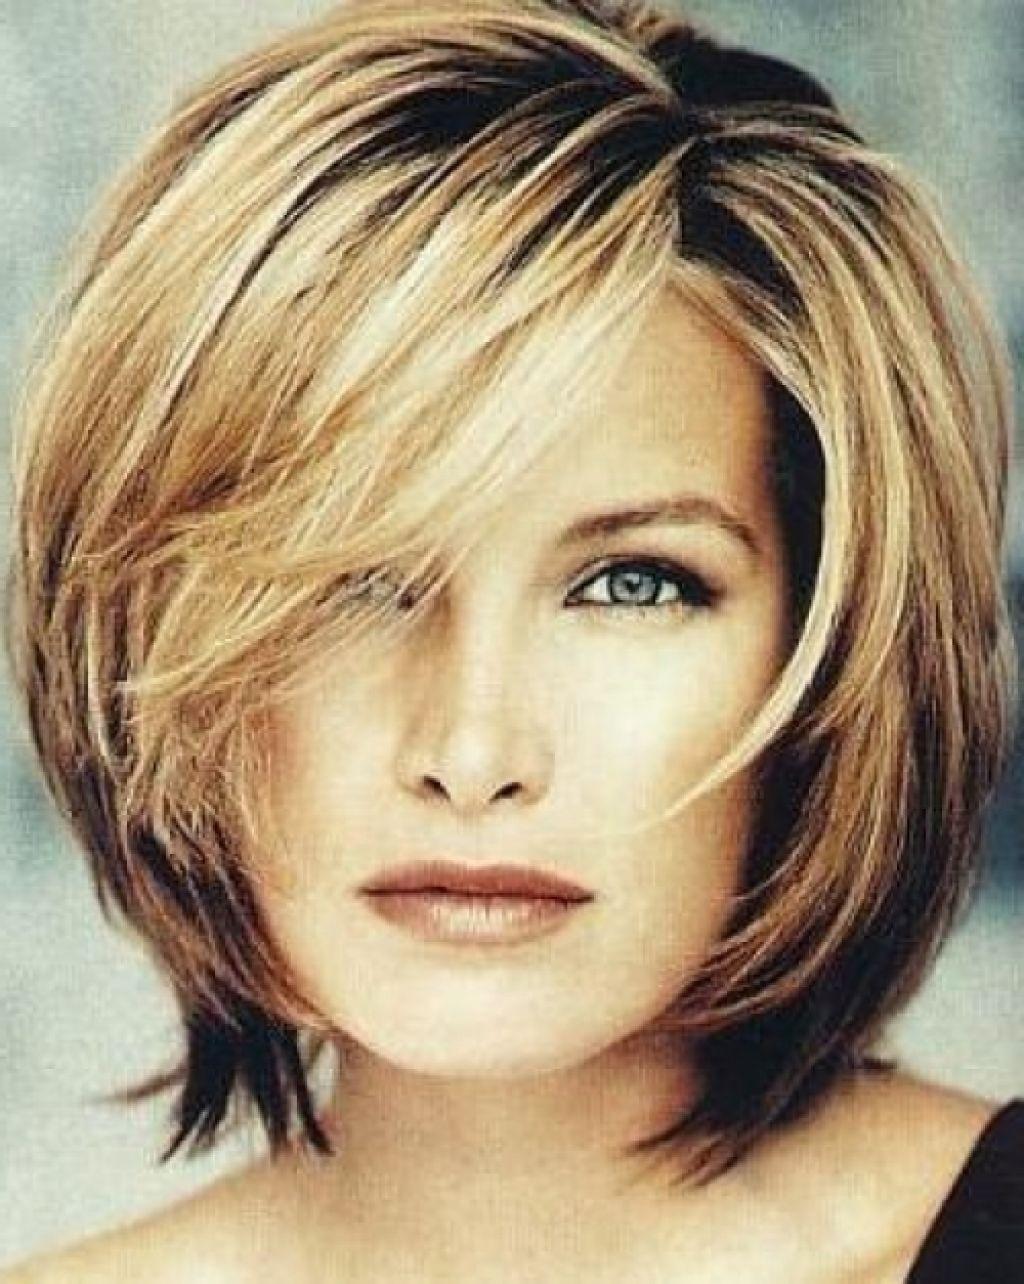 medium hairstyles for women over 40 : medium length hairstyles